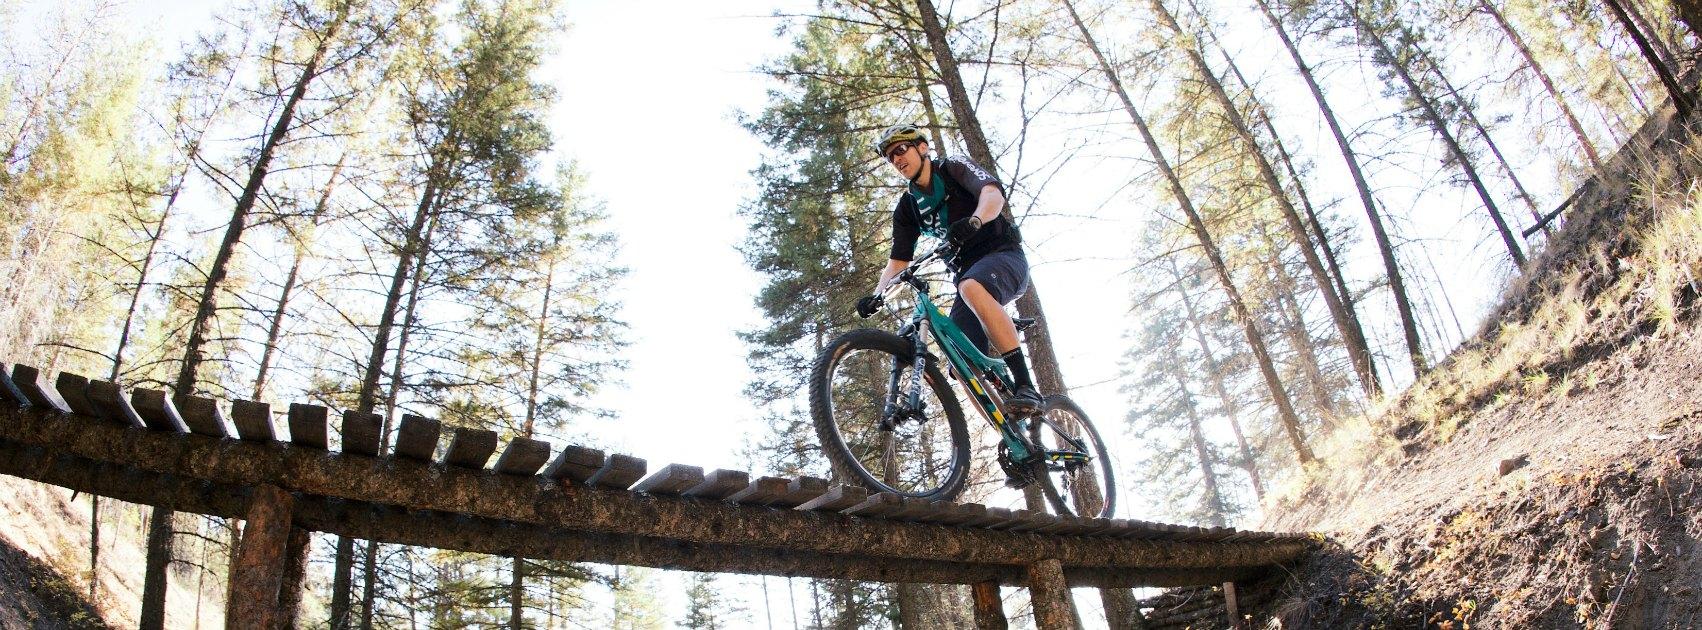 smith creek trails | West Kelowna | Visit Westside